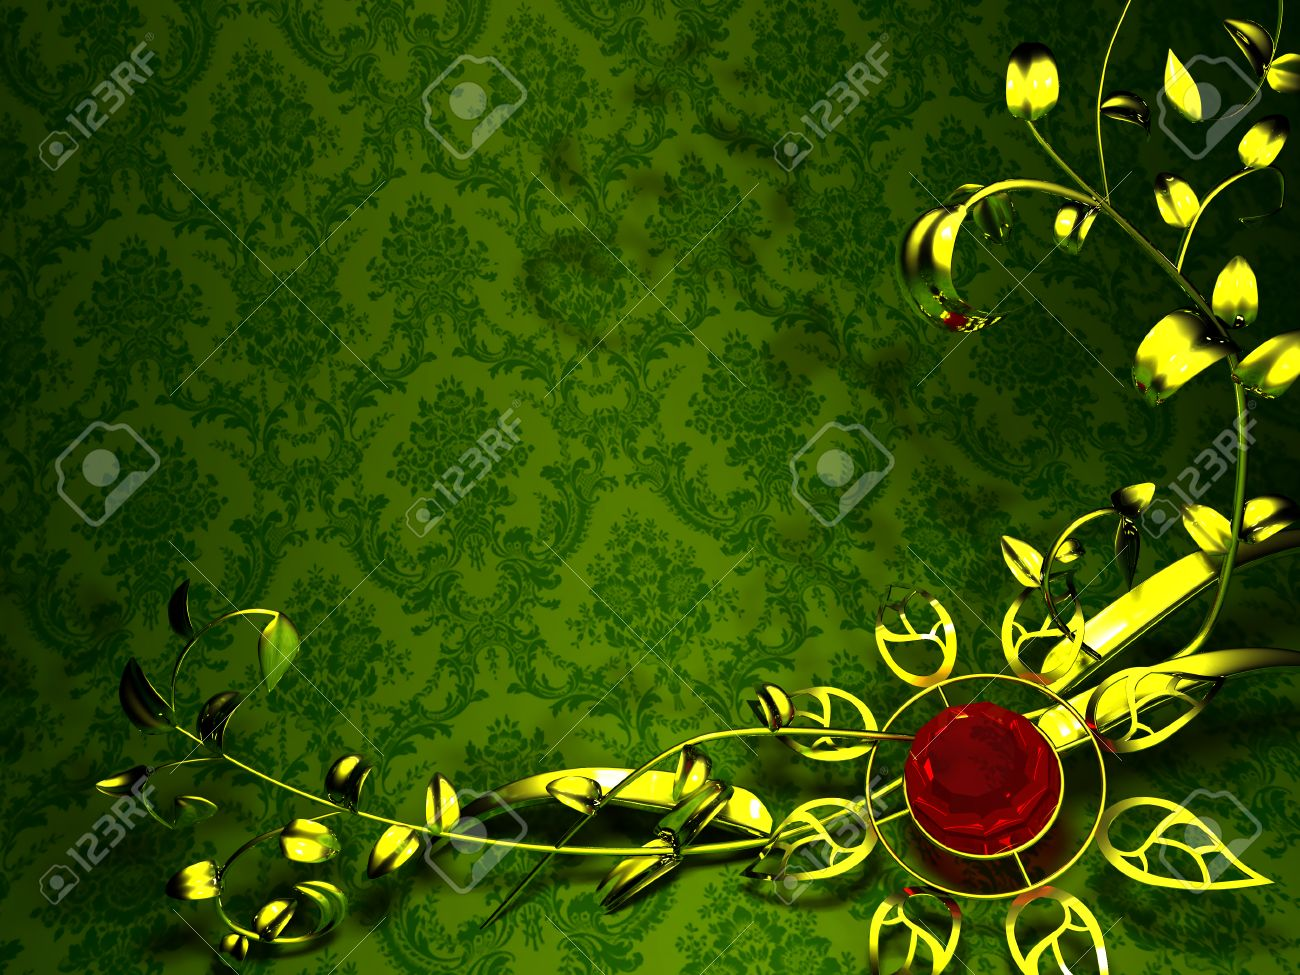 Gold Floral Design On A Background Of Vintage Green Wallpaper Flower Stock Photo